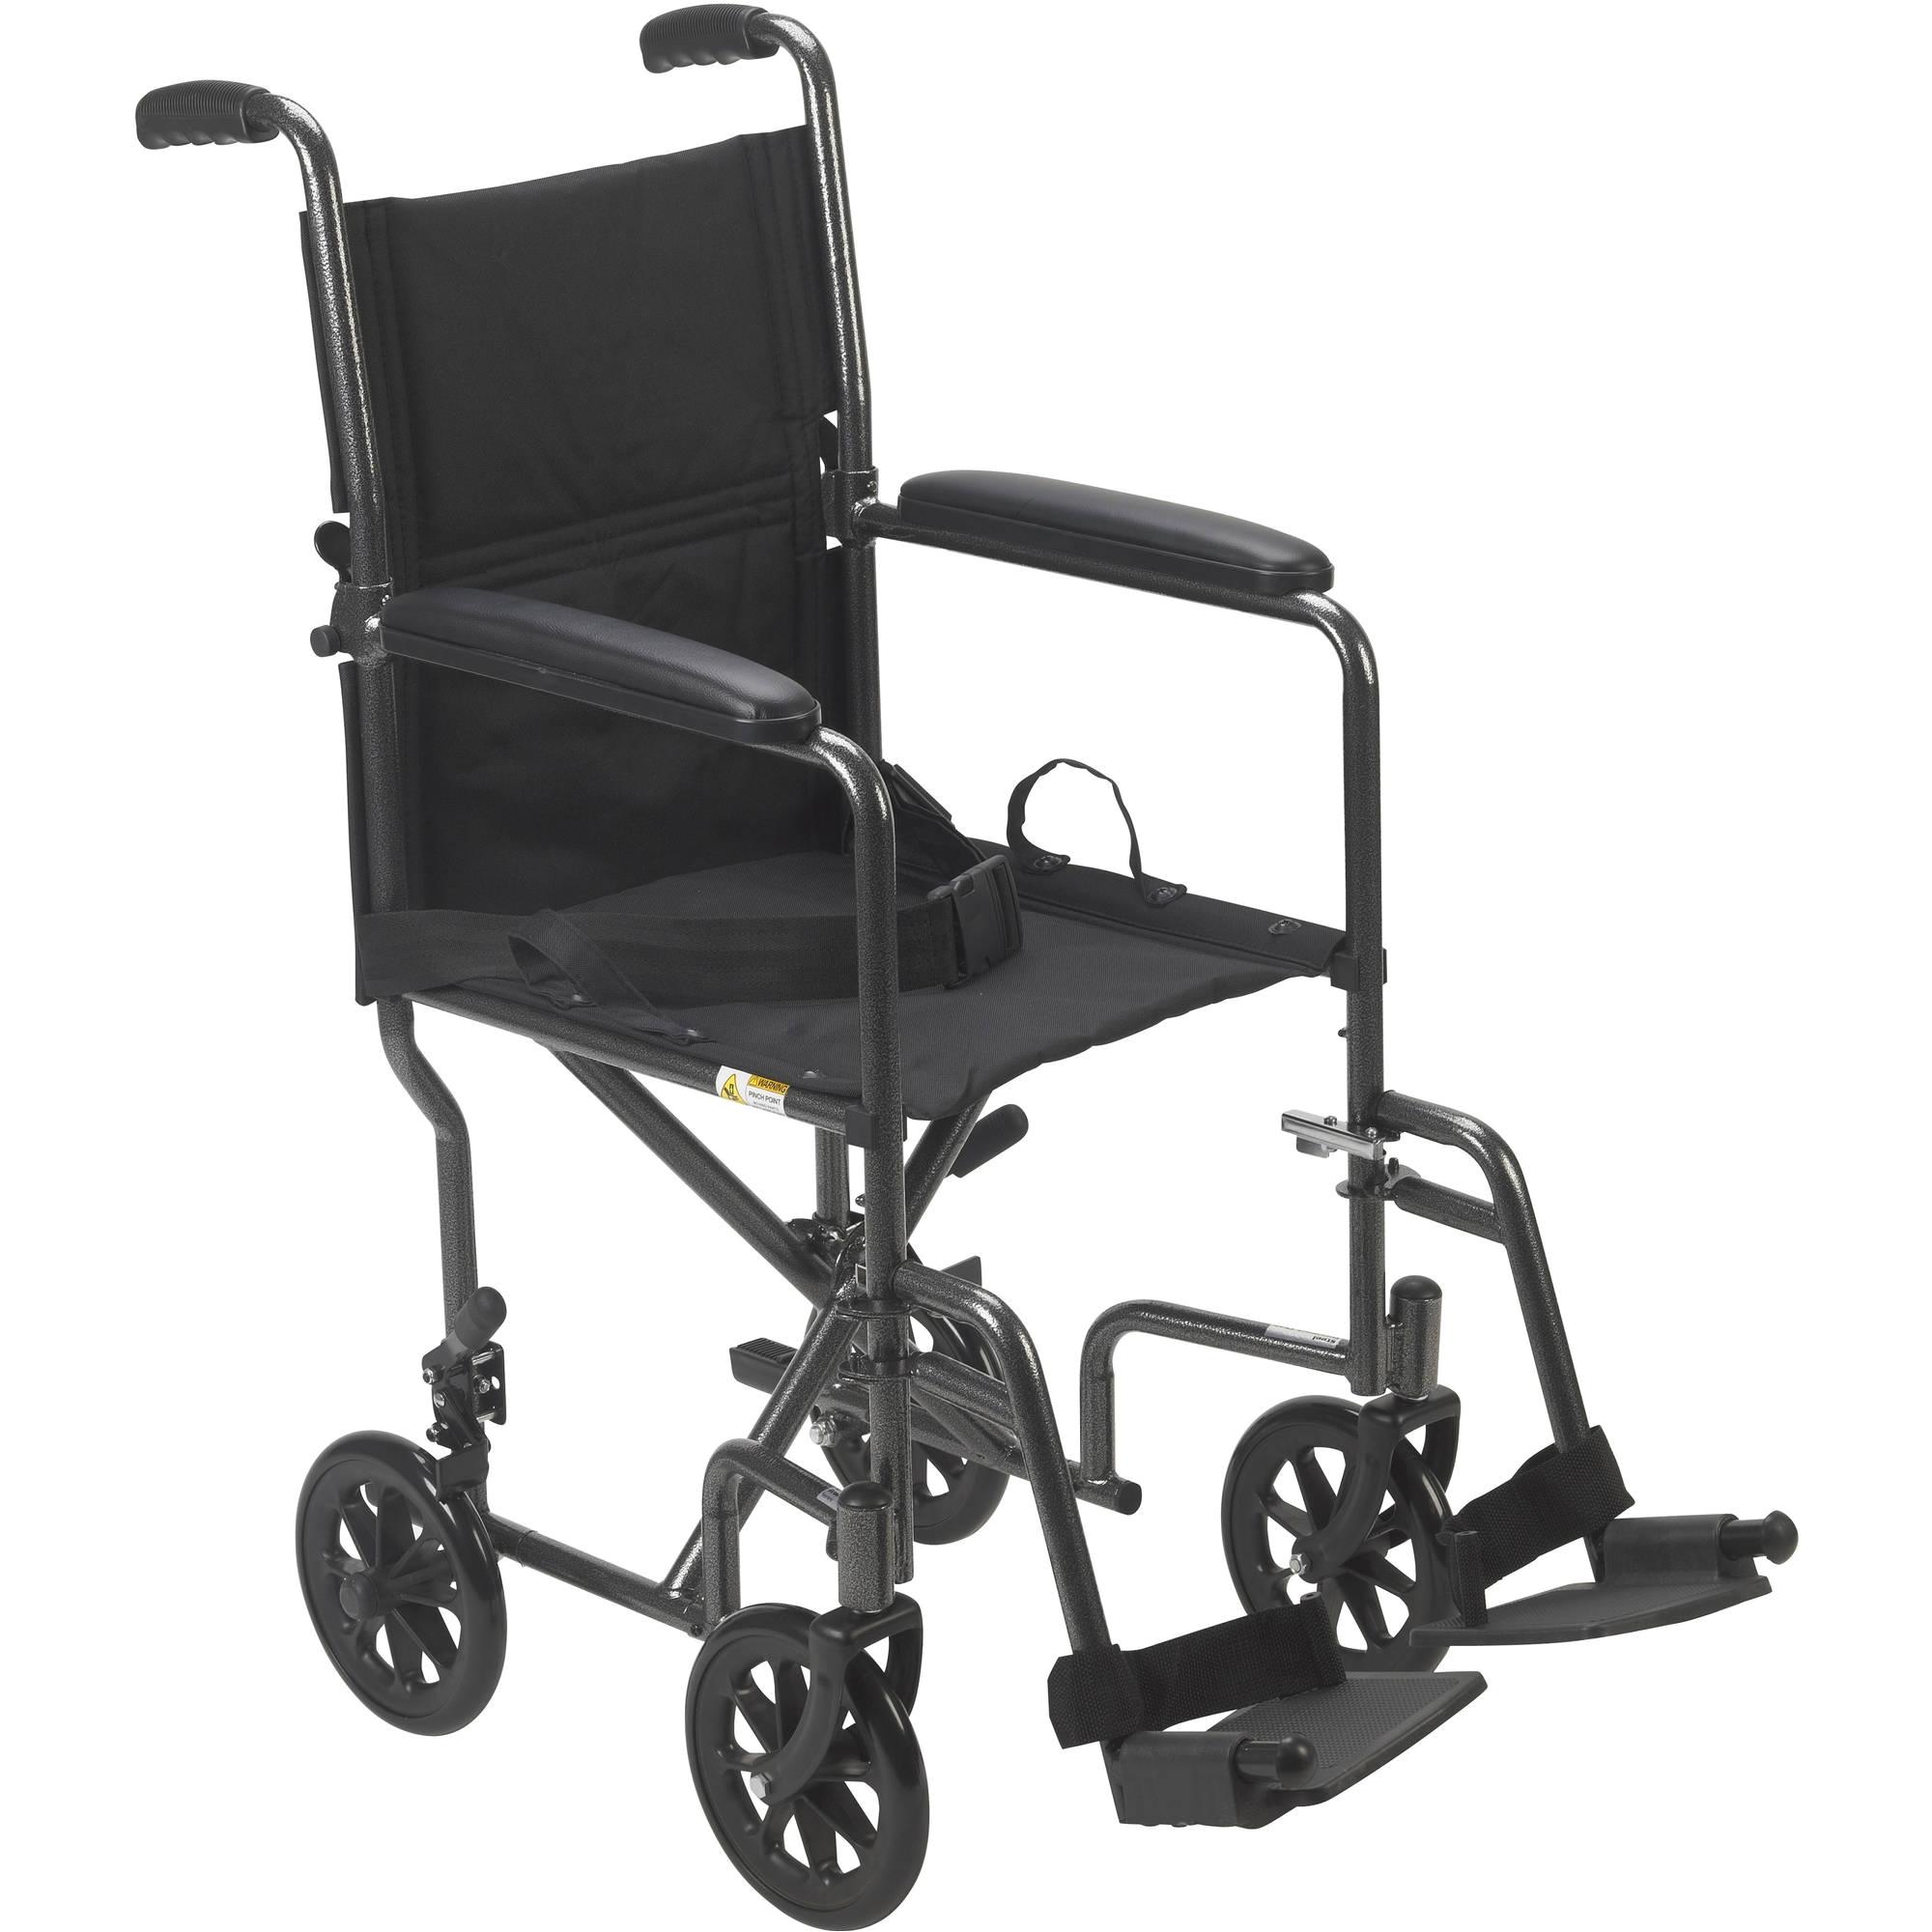 Walmart Steel Transport Chair Chair Transport Wheelchair with 12 Rear Wheels Sunrise Medical